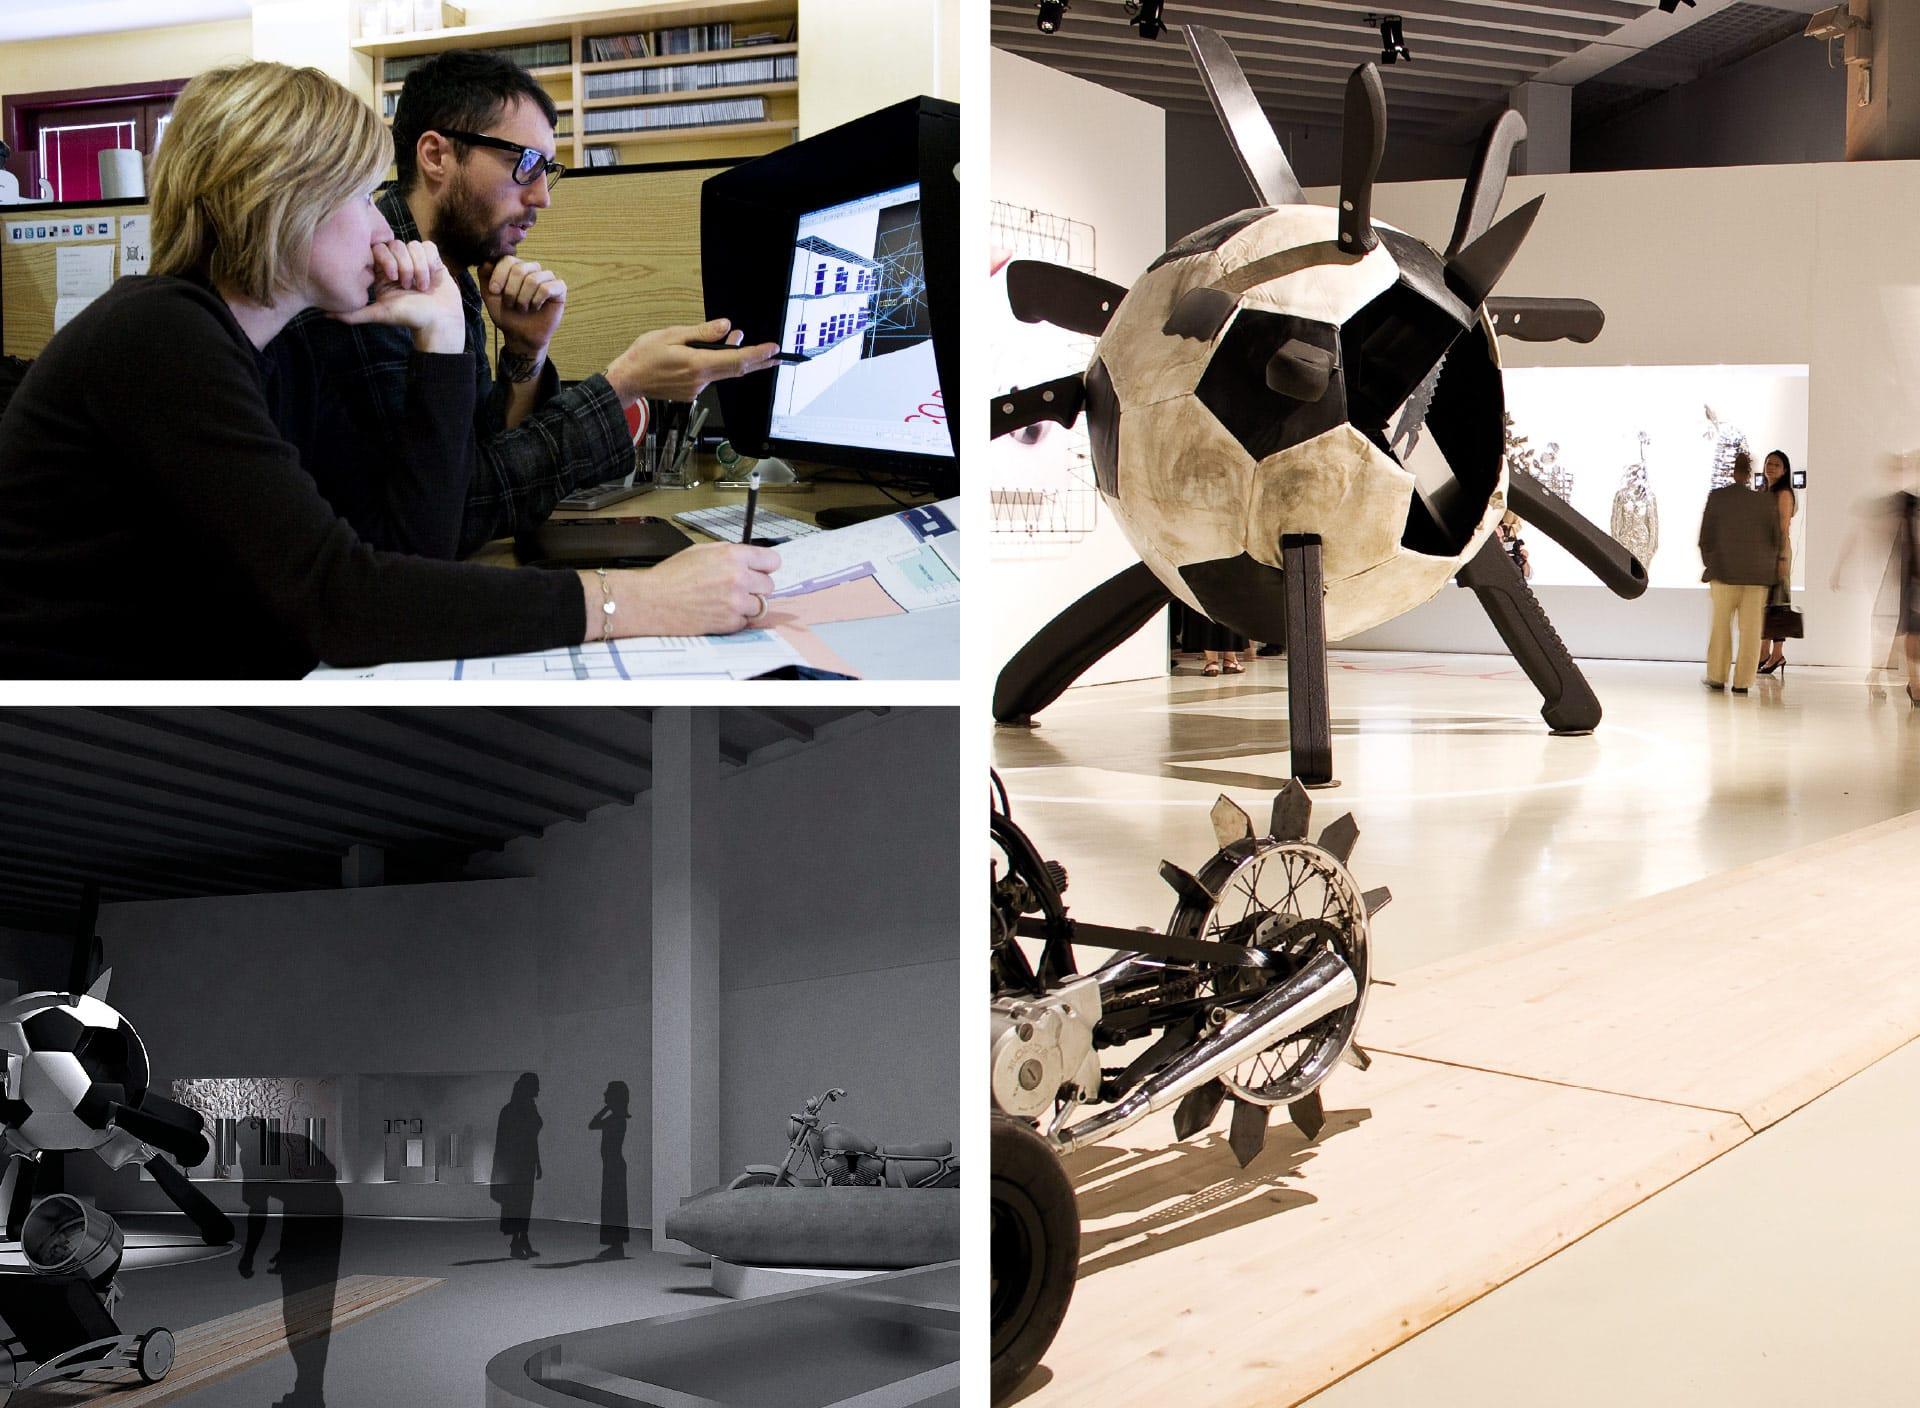 https://www.studiochiesa.it/wp-content/uploads/2021/01/Studio-Chiesa-Steellife-mostra-arte-contemporanea-case-history-08-1.jpg